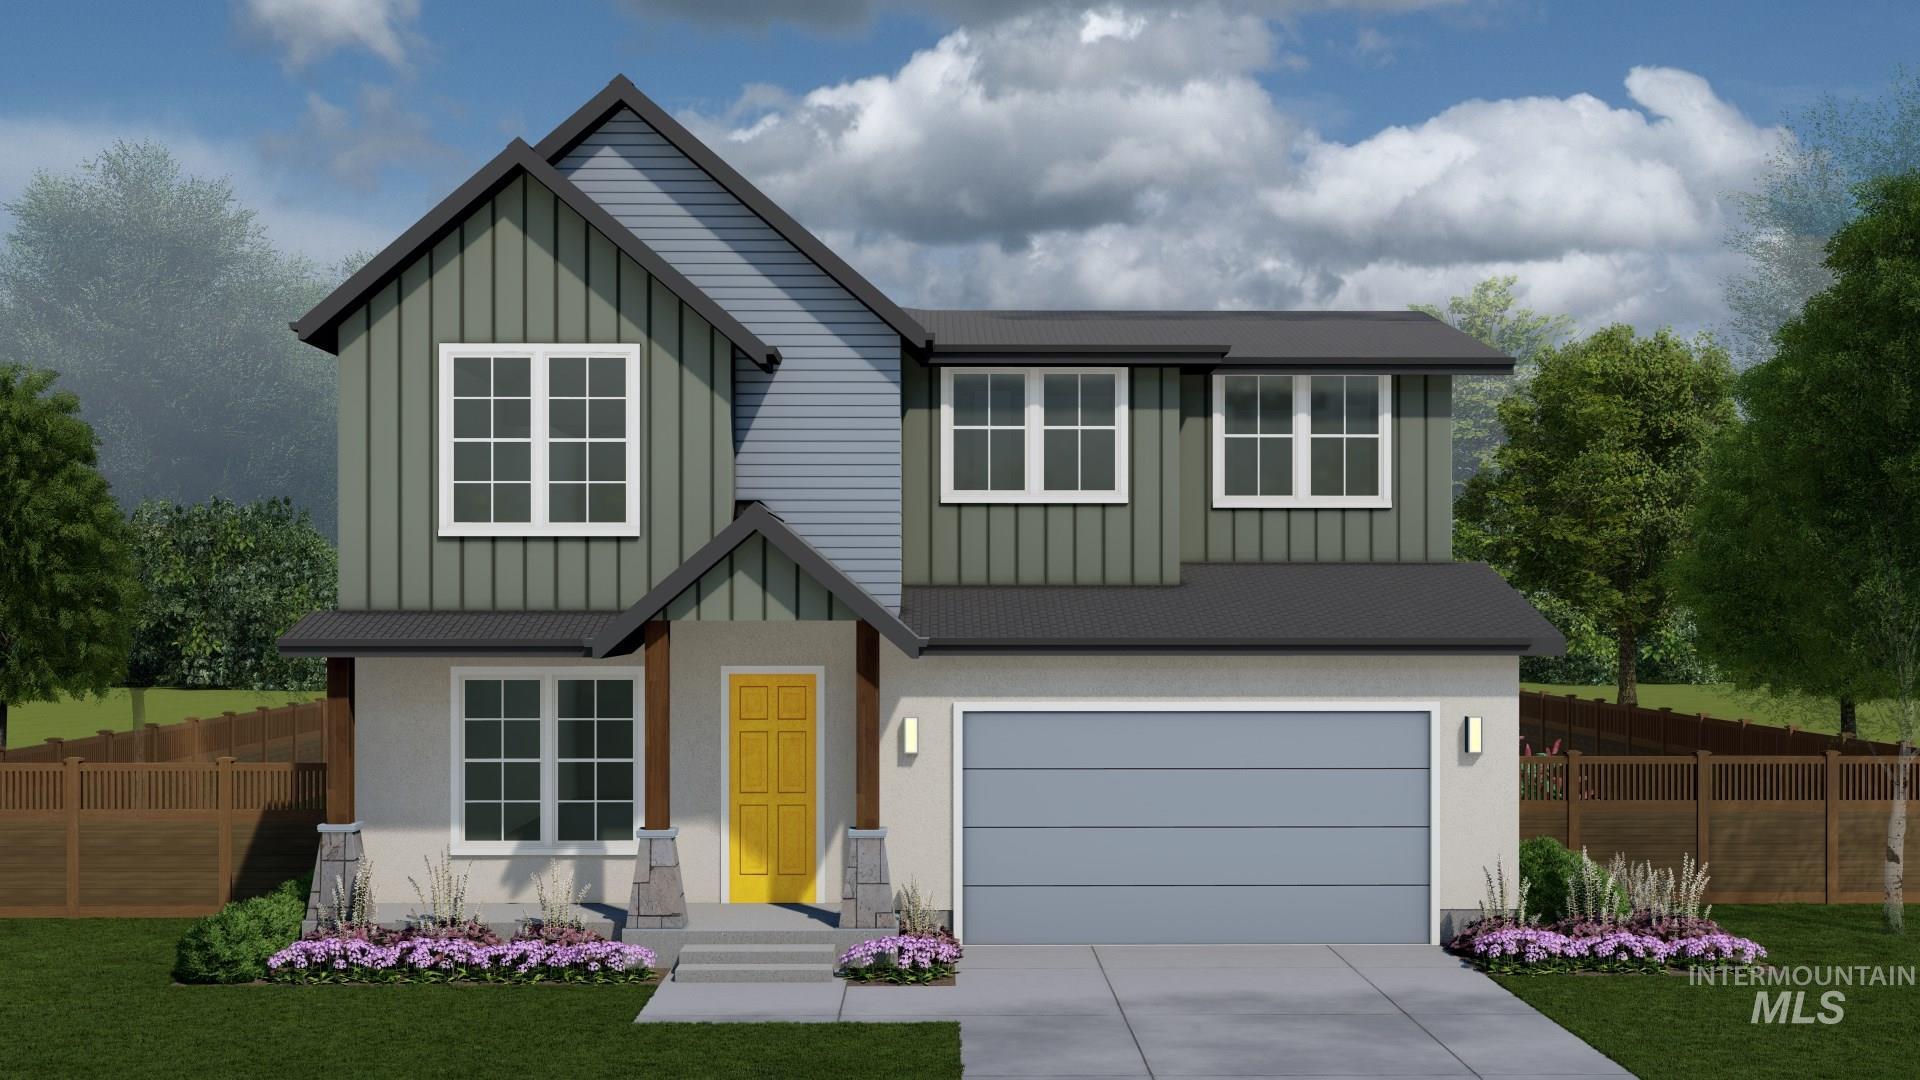 2902 W Neff St Property Photo - Boise, ID real estate listing